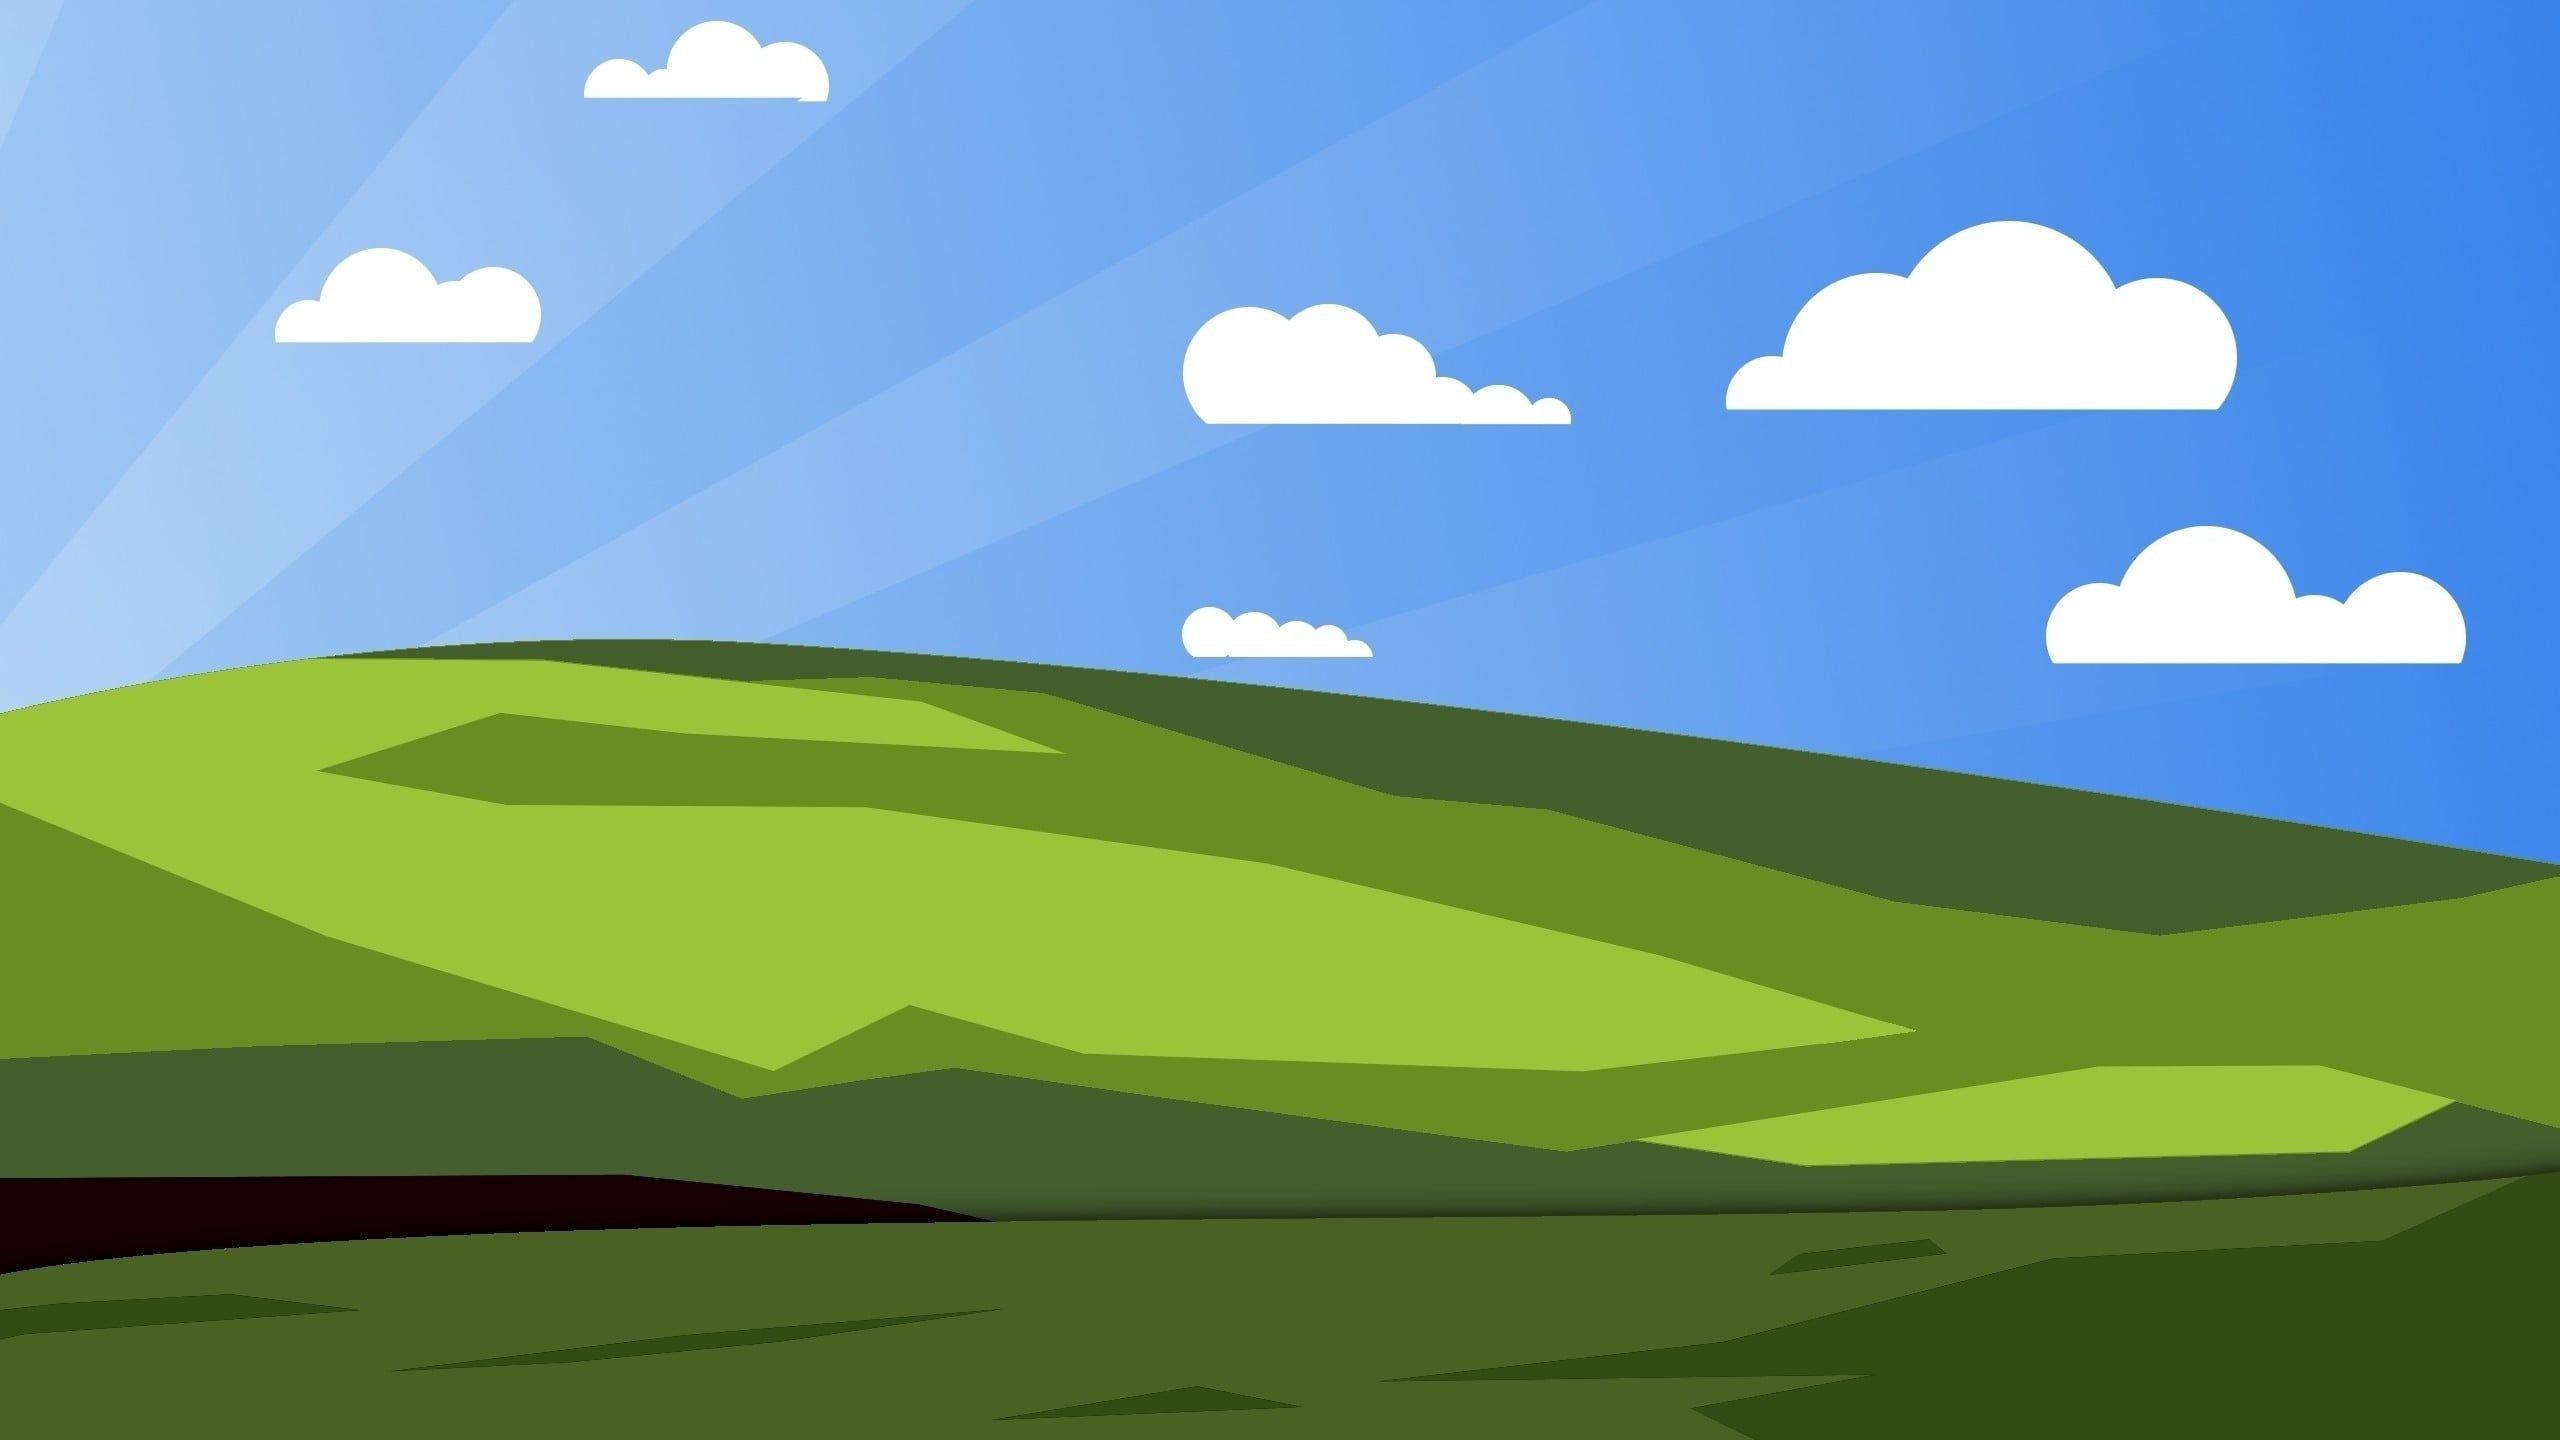 green grass under blue skies wallpaper bliss minimalism